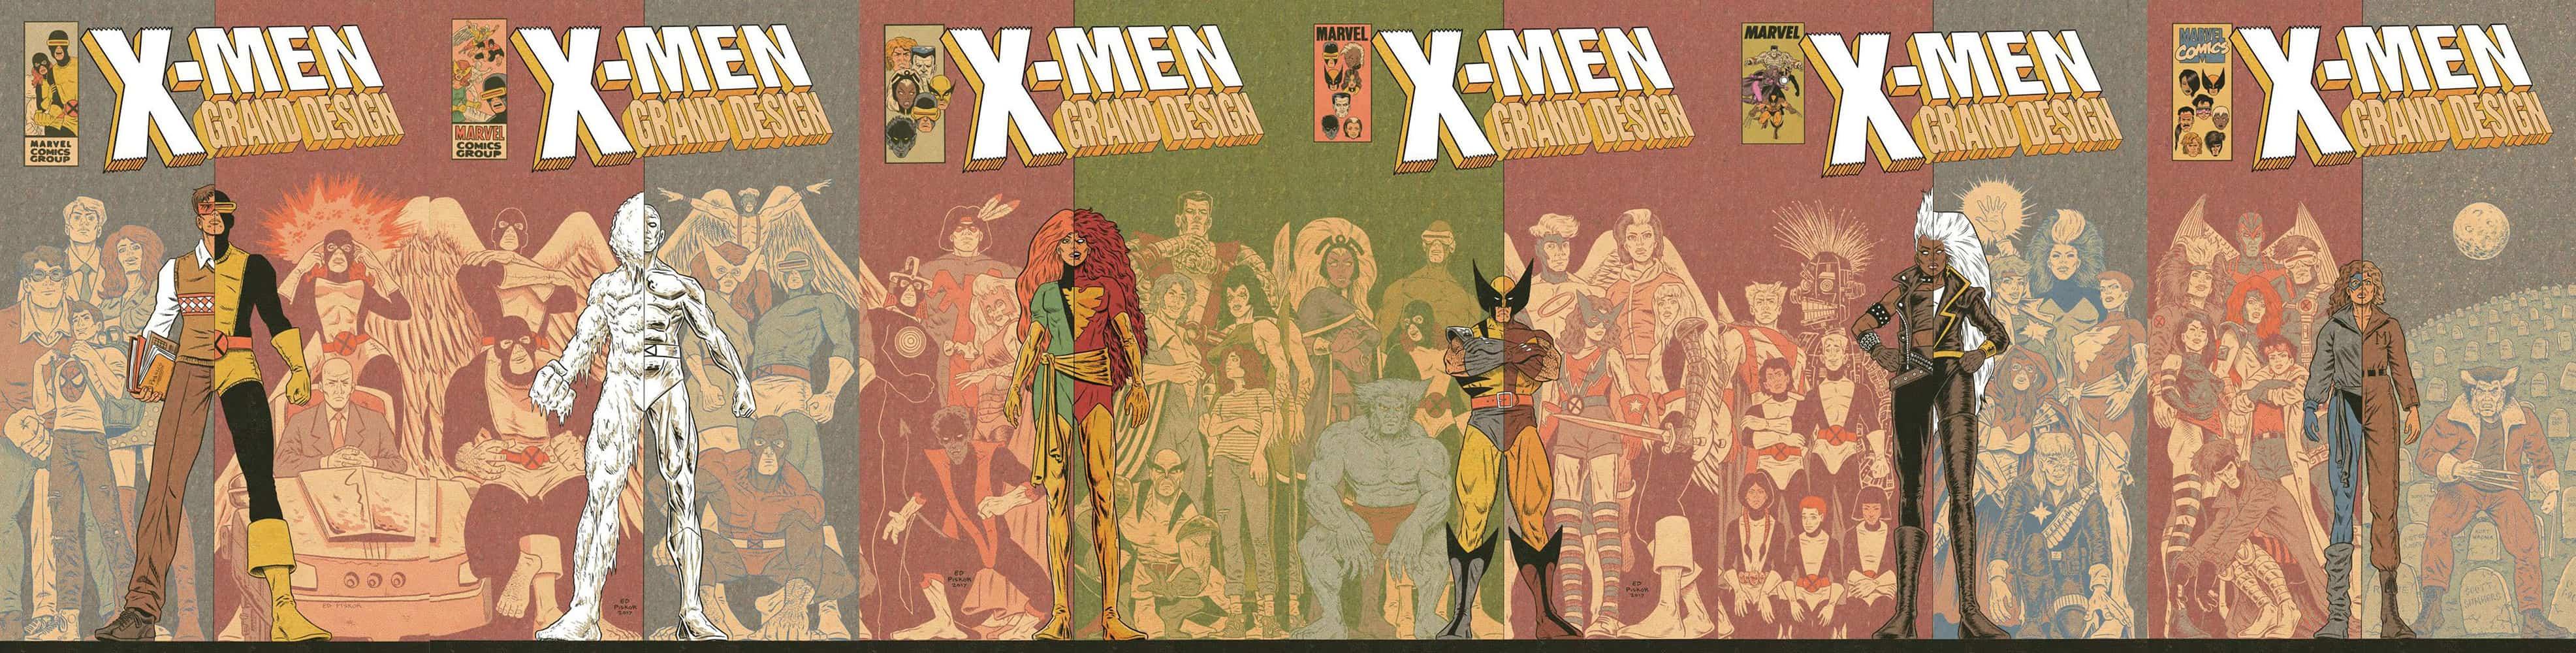 x-men-grand-design-all-covers-optimized